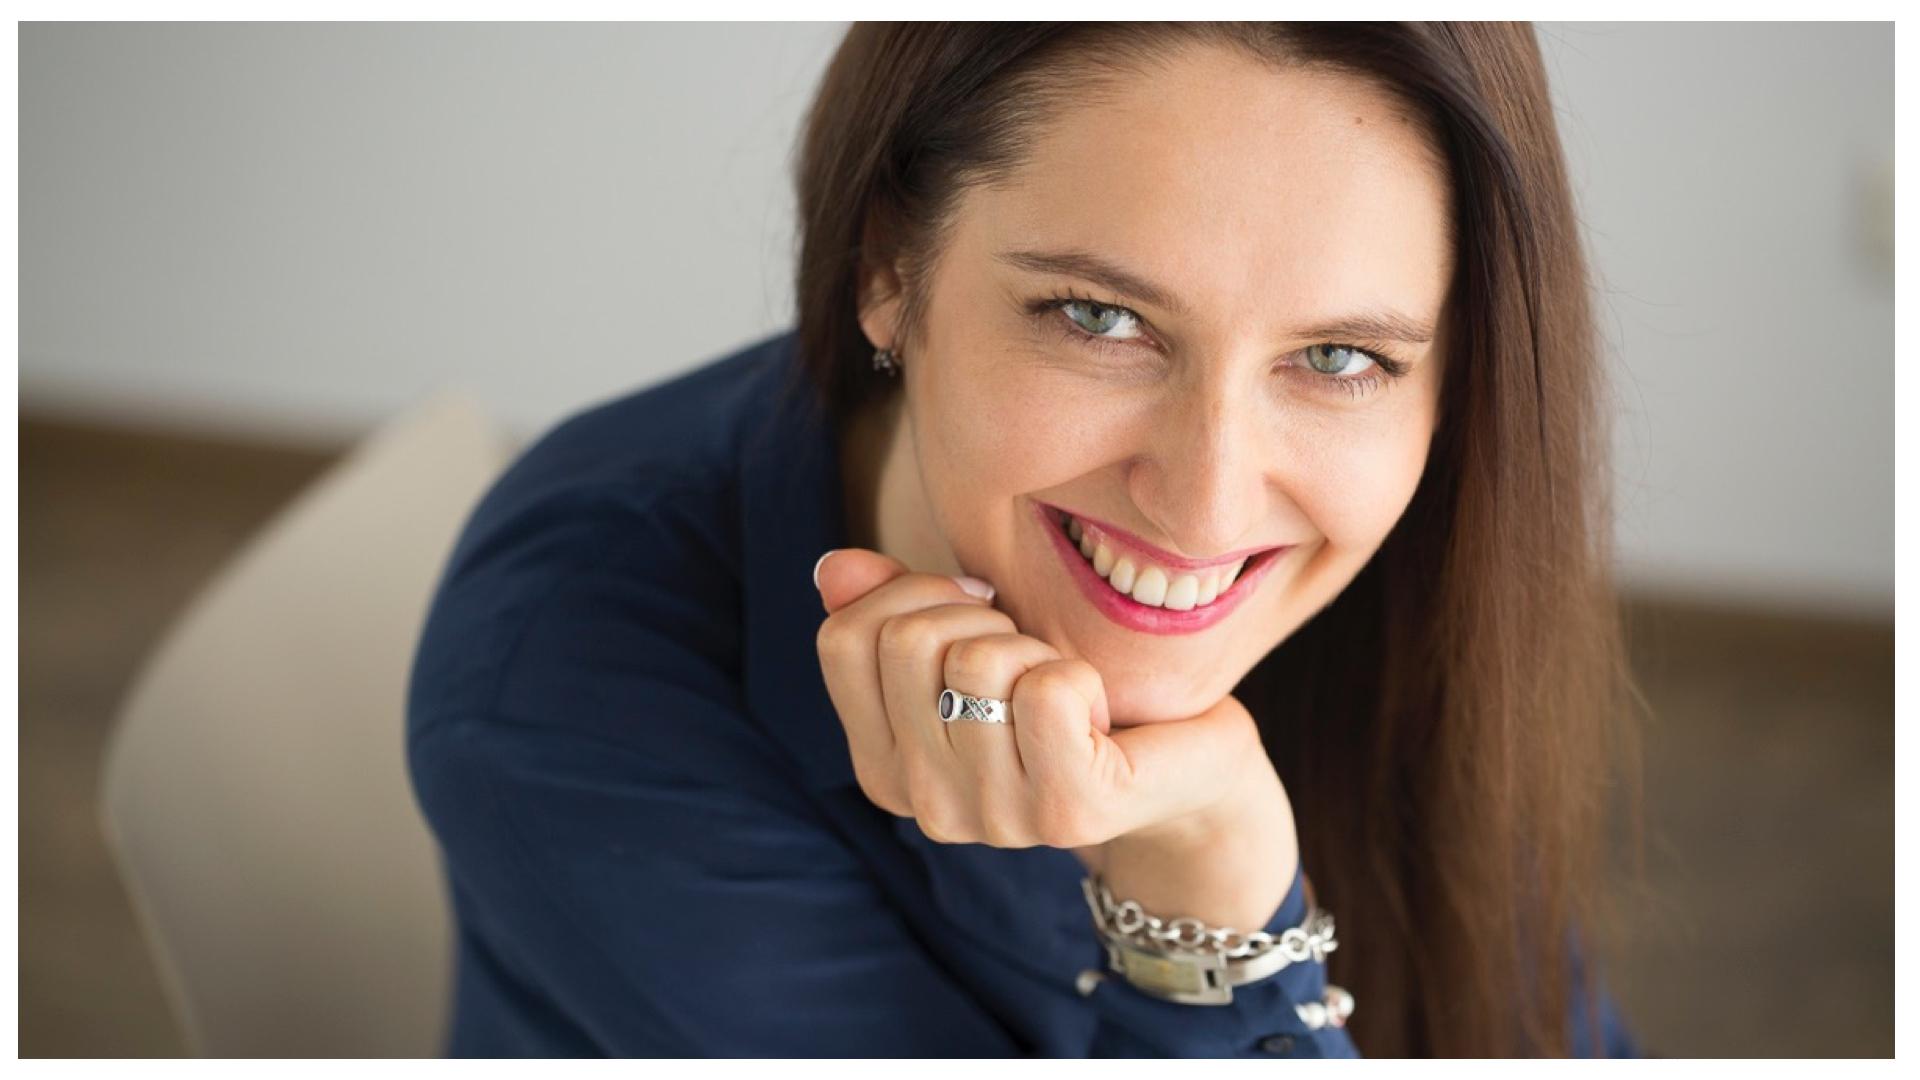 Izabella Wojtaszek